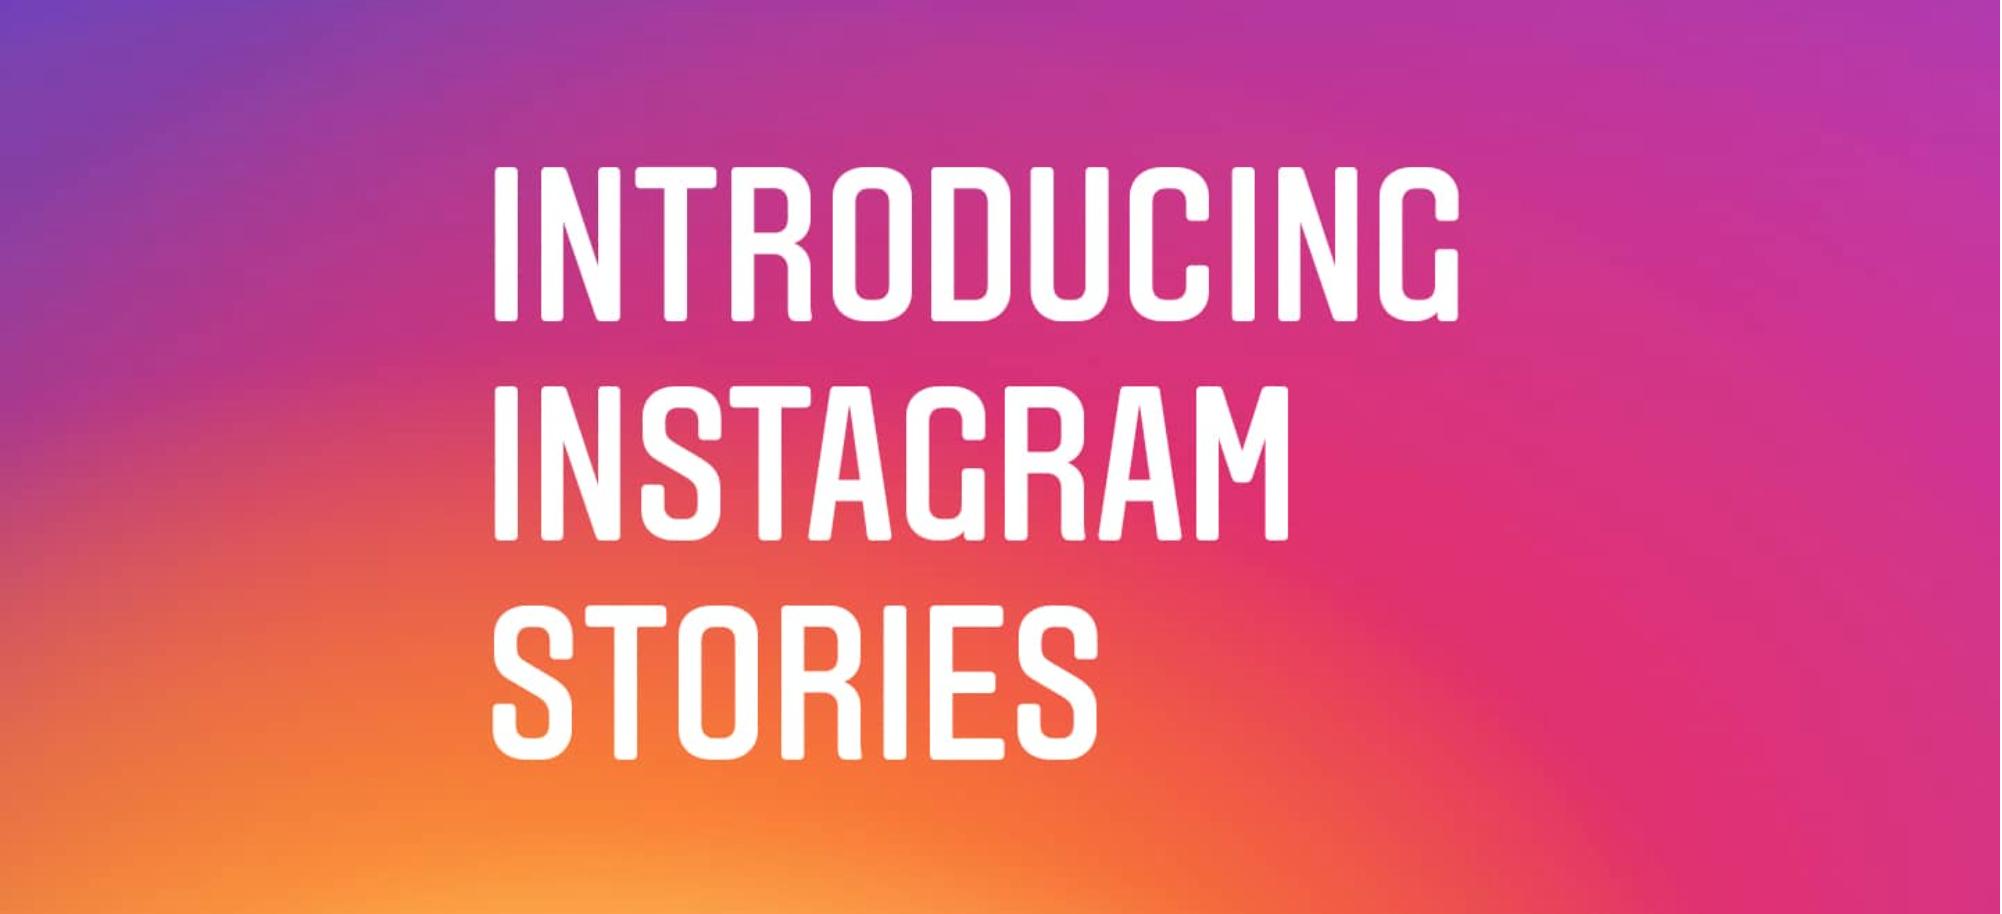 FITUR BARU. Instagram meluncurkan Instagram Stories, Rabu, 2 Agustus. Foto dari blog Instagram.